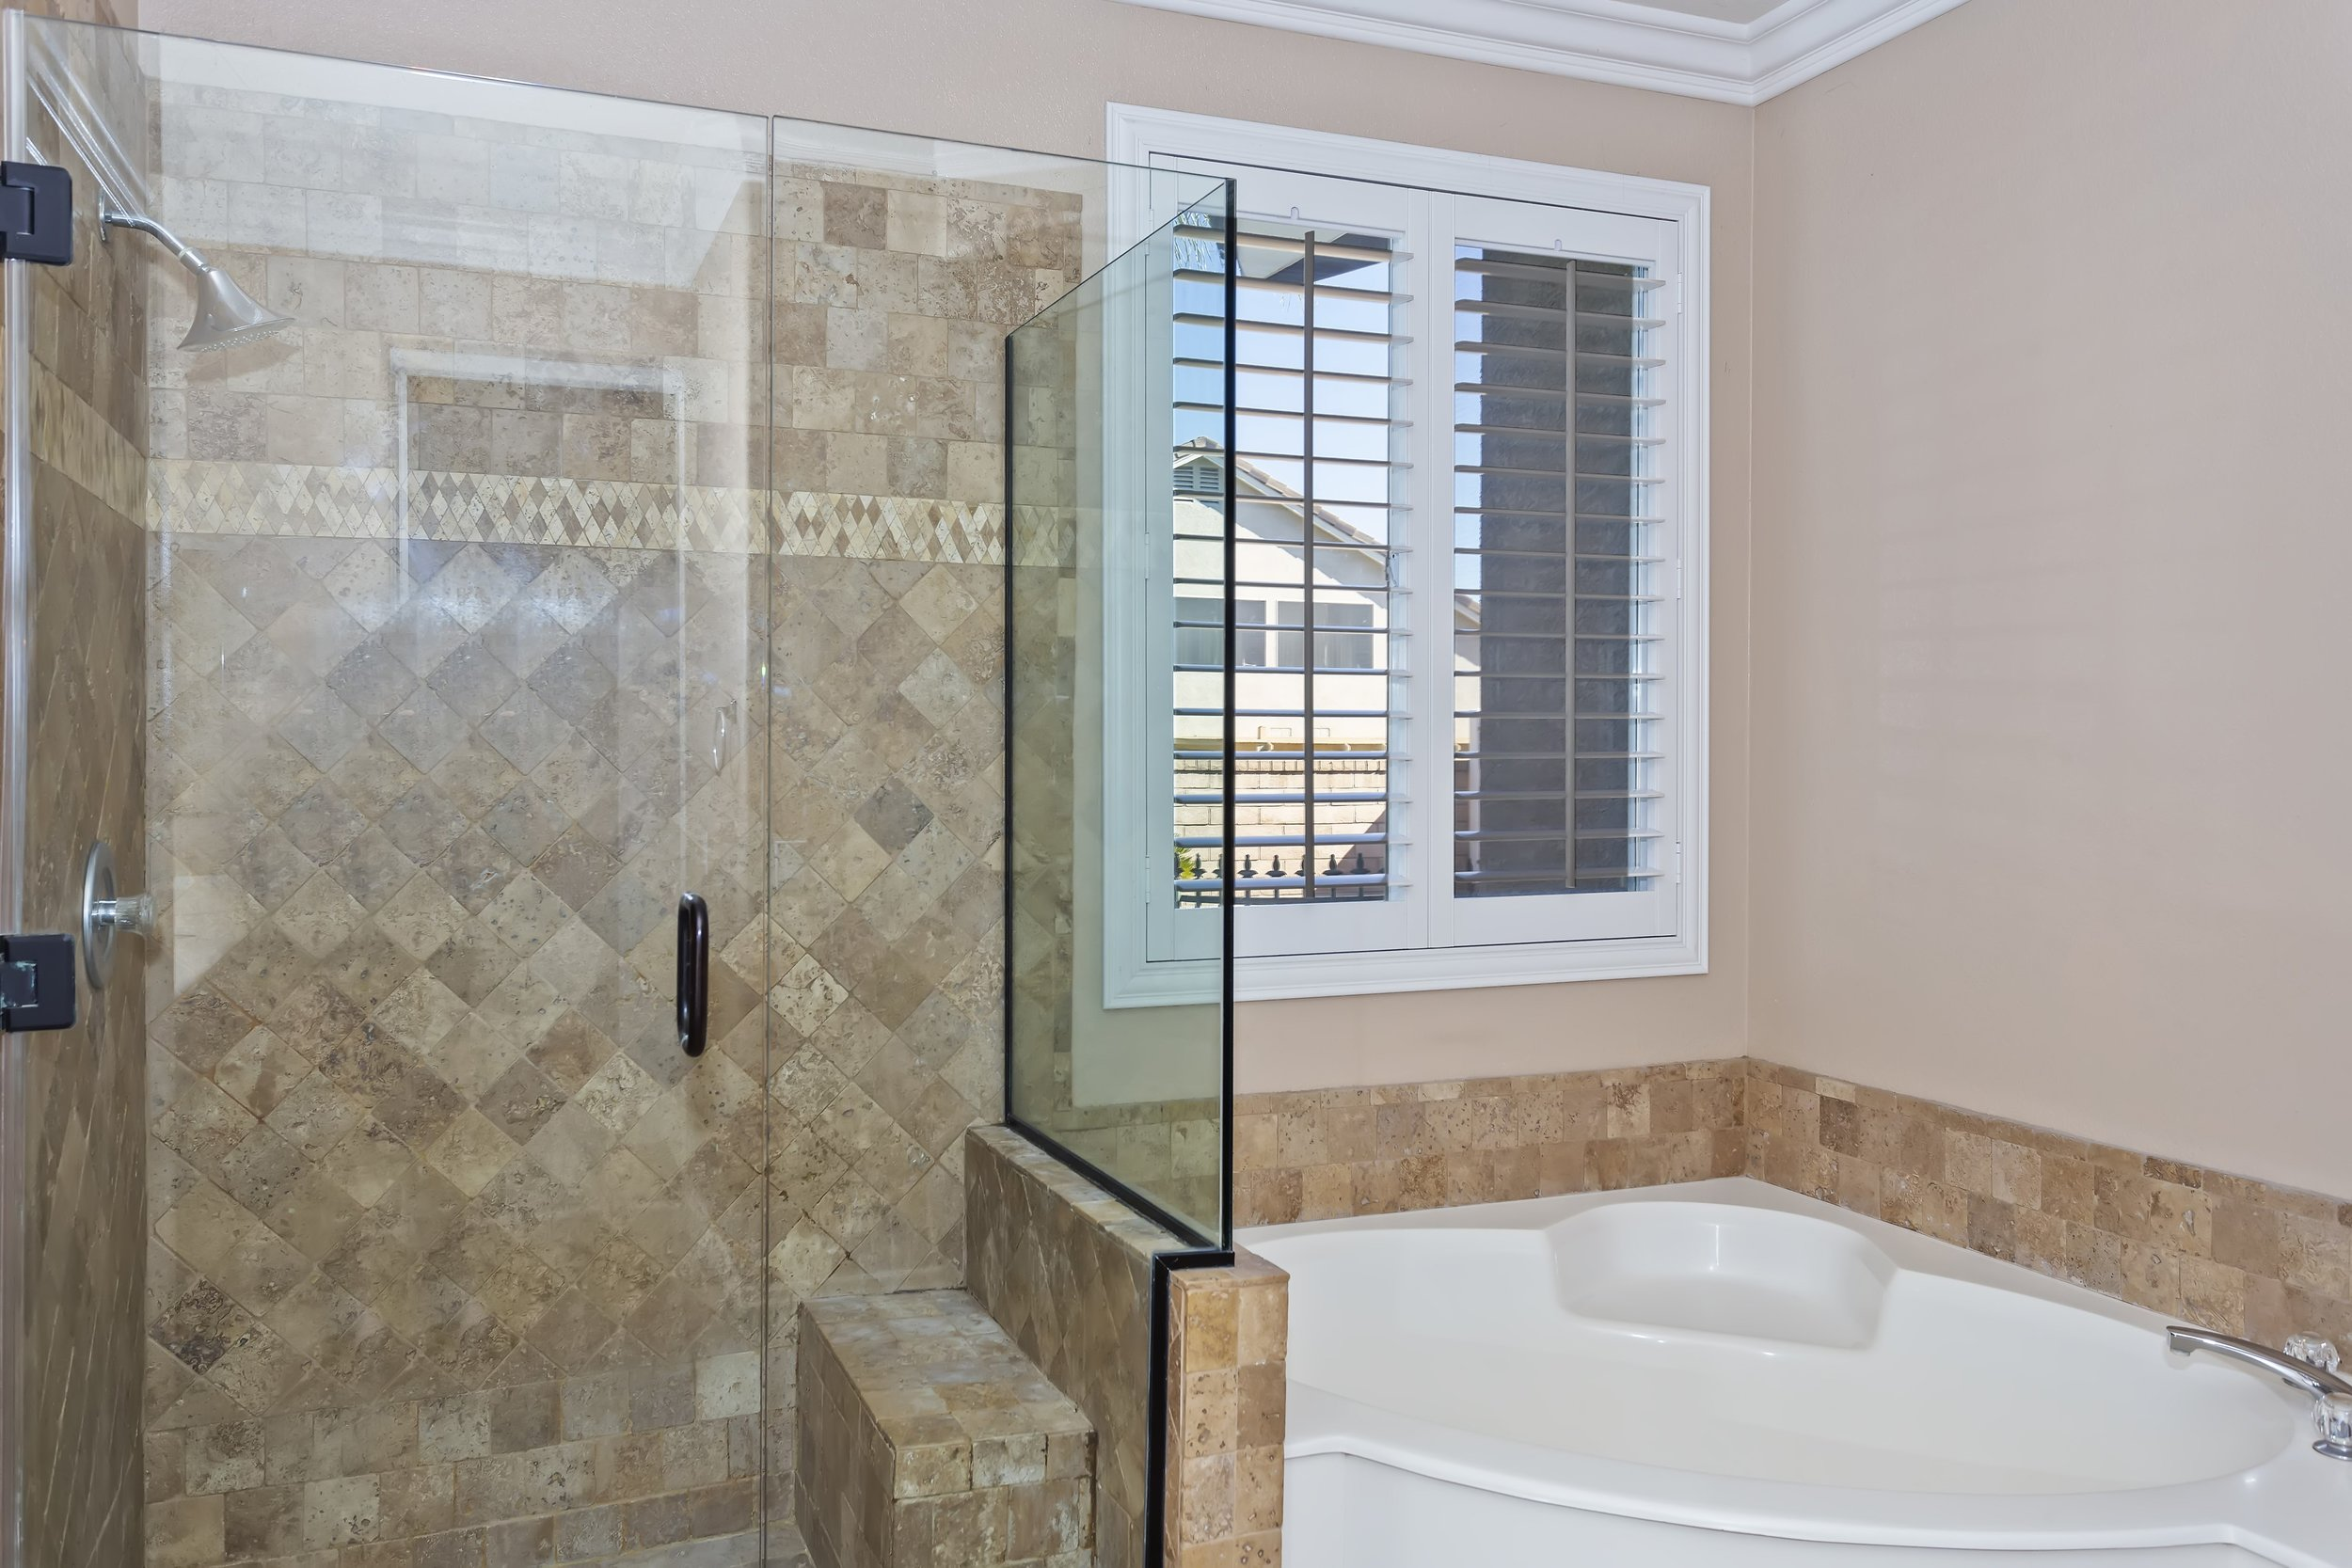 029_Master Bathroom.jpg